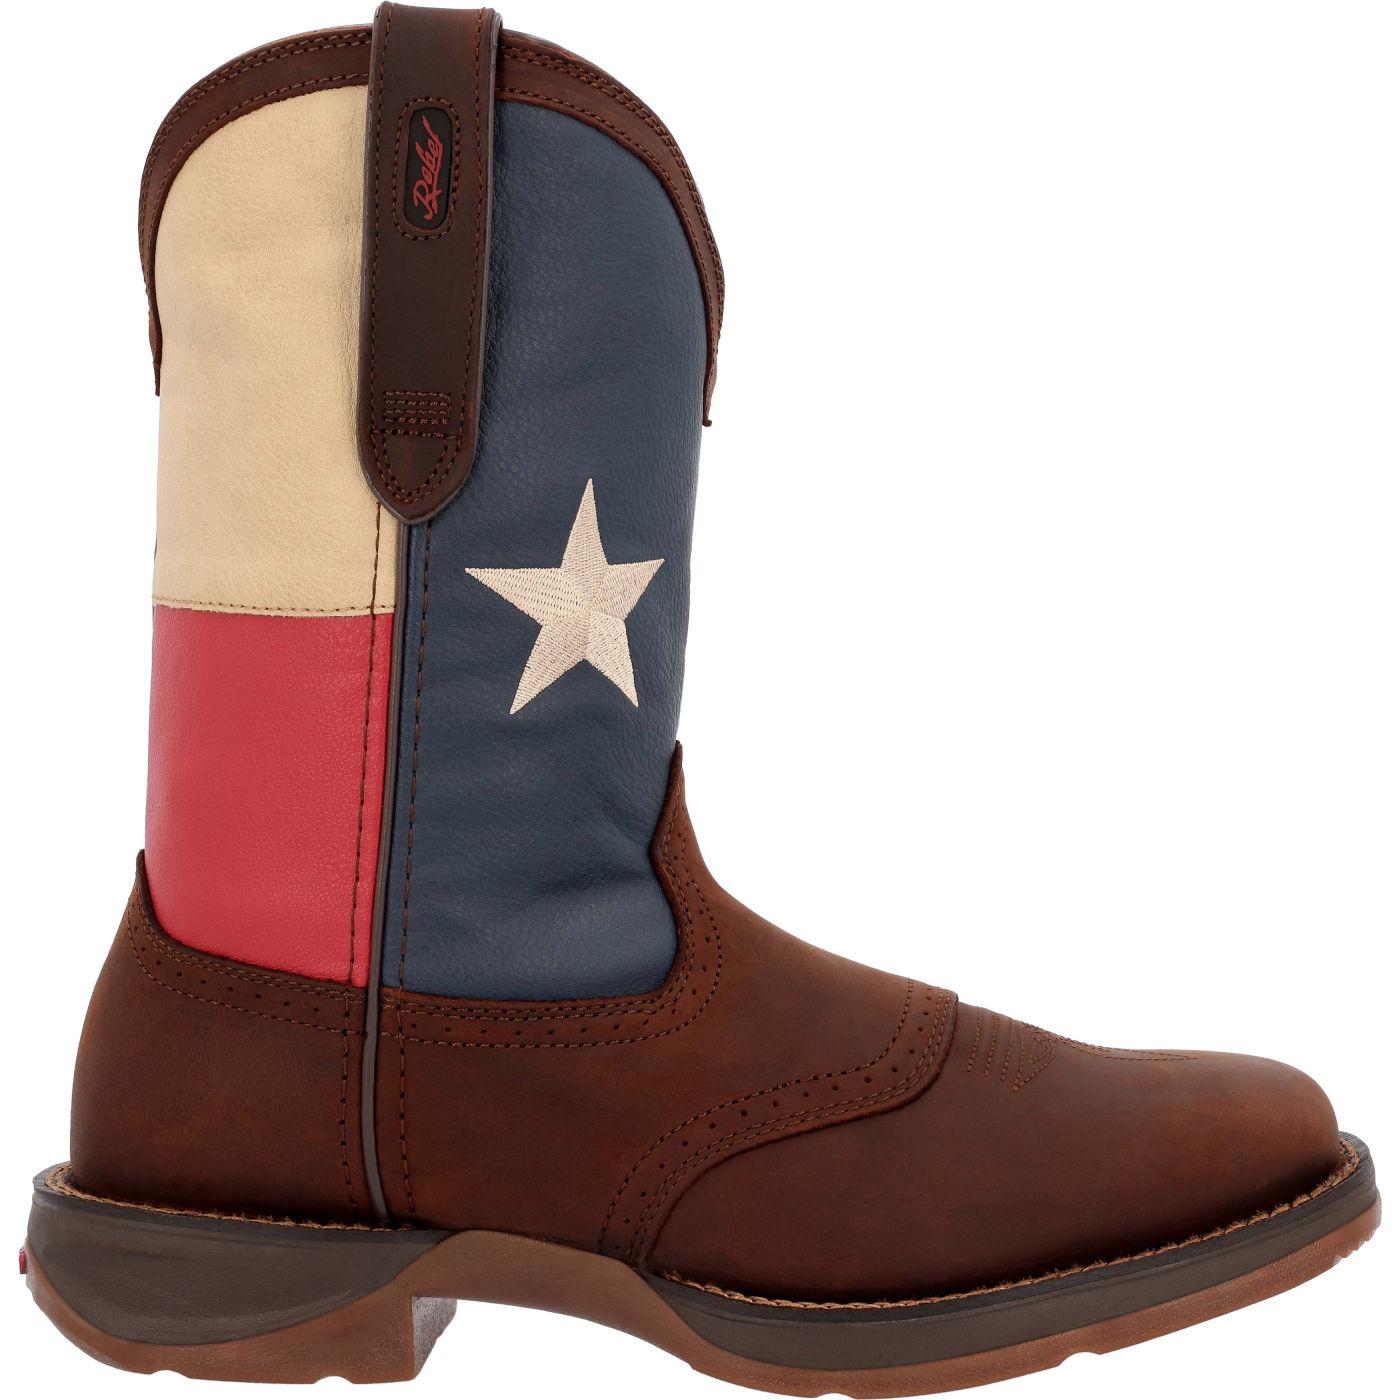 ea18d1233d5 Rebel by Durango Texas Flag Western Boot